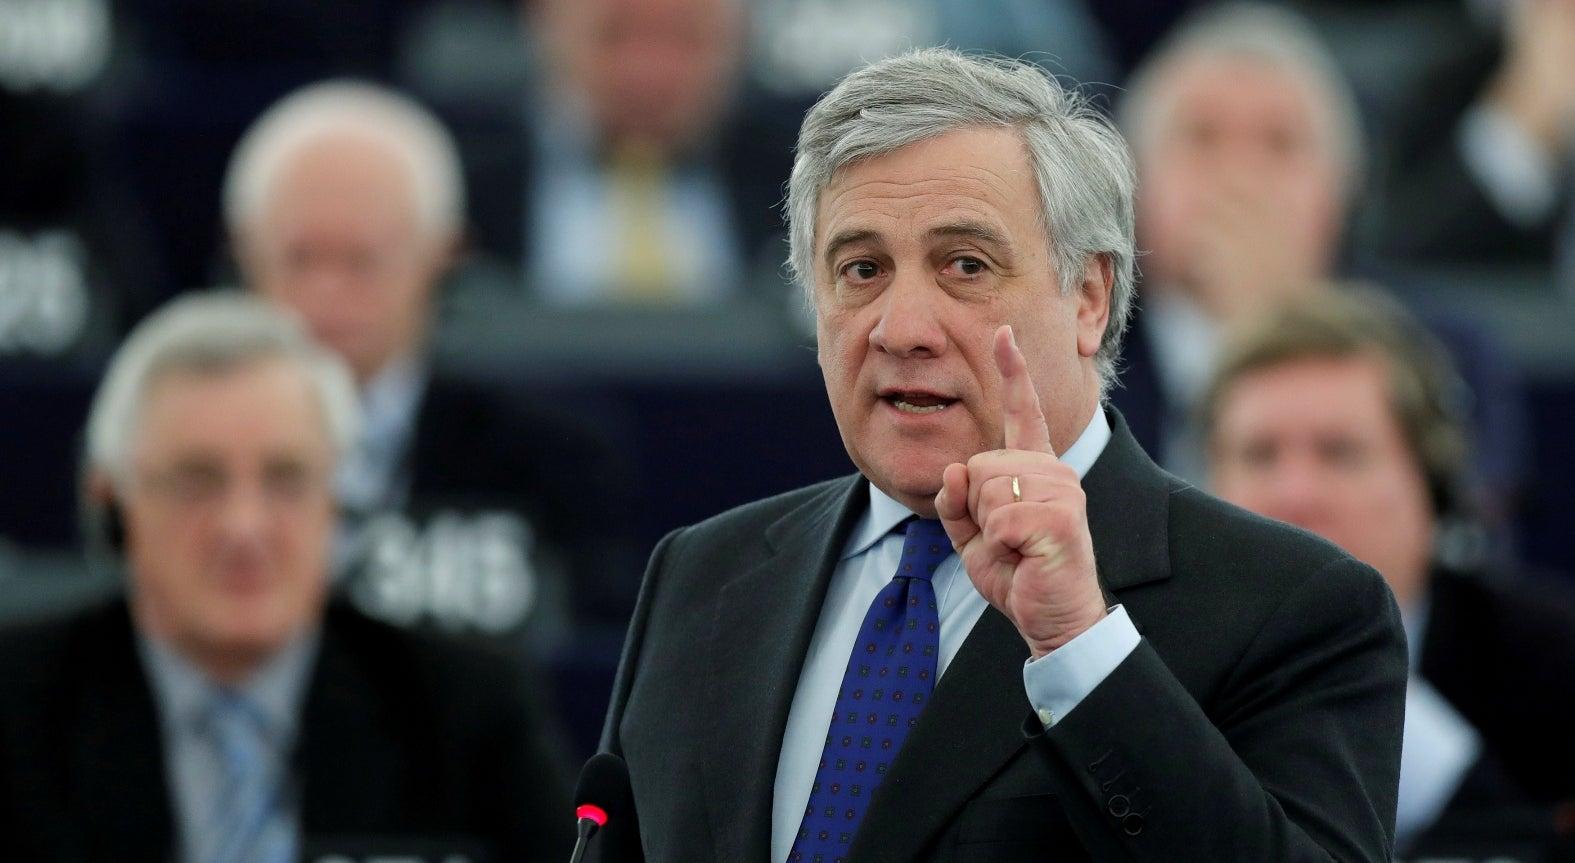 Antonio Tajani eleito presidente do Parlamento Europeu